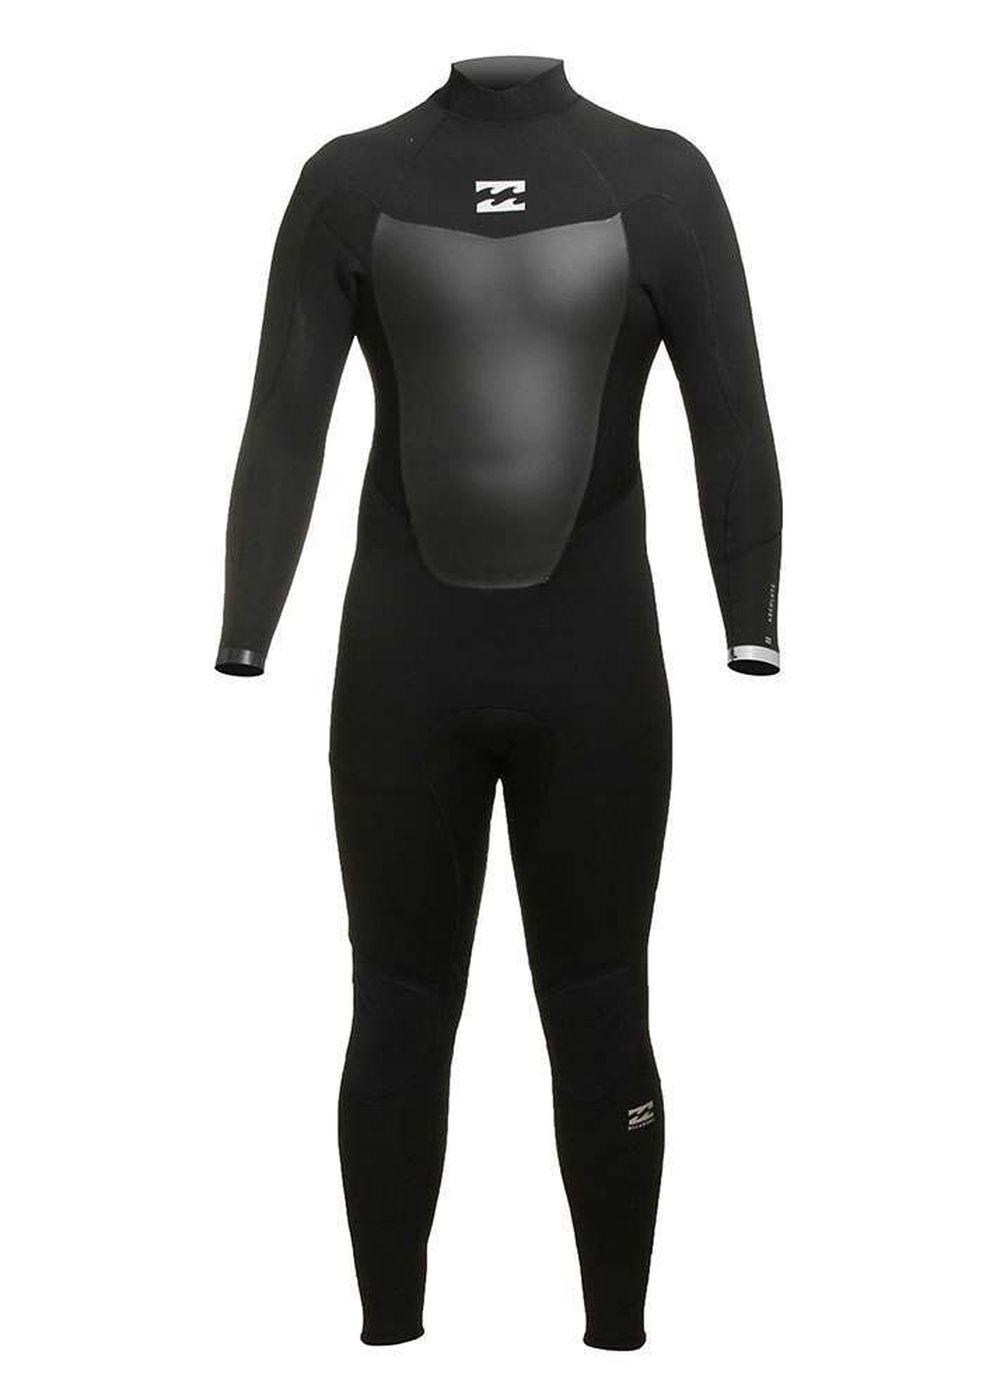 Billabong Absolute Comp Bz 5/4 Wetsuit 2018 Black Picture